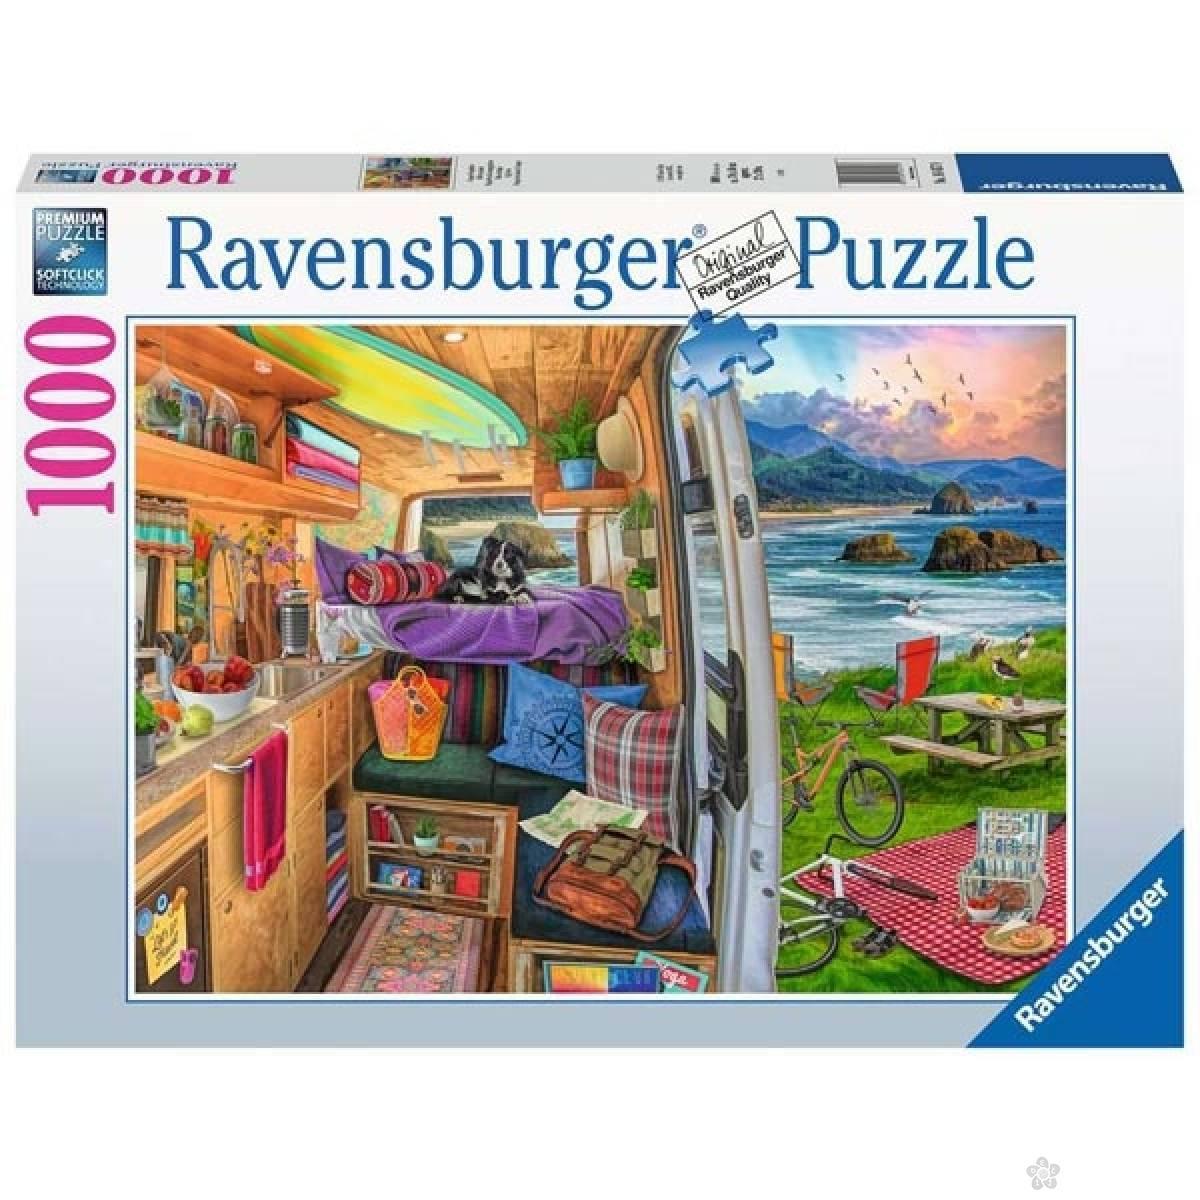 Ravensburger puzzle Najlepše bekstvo RA16457